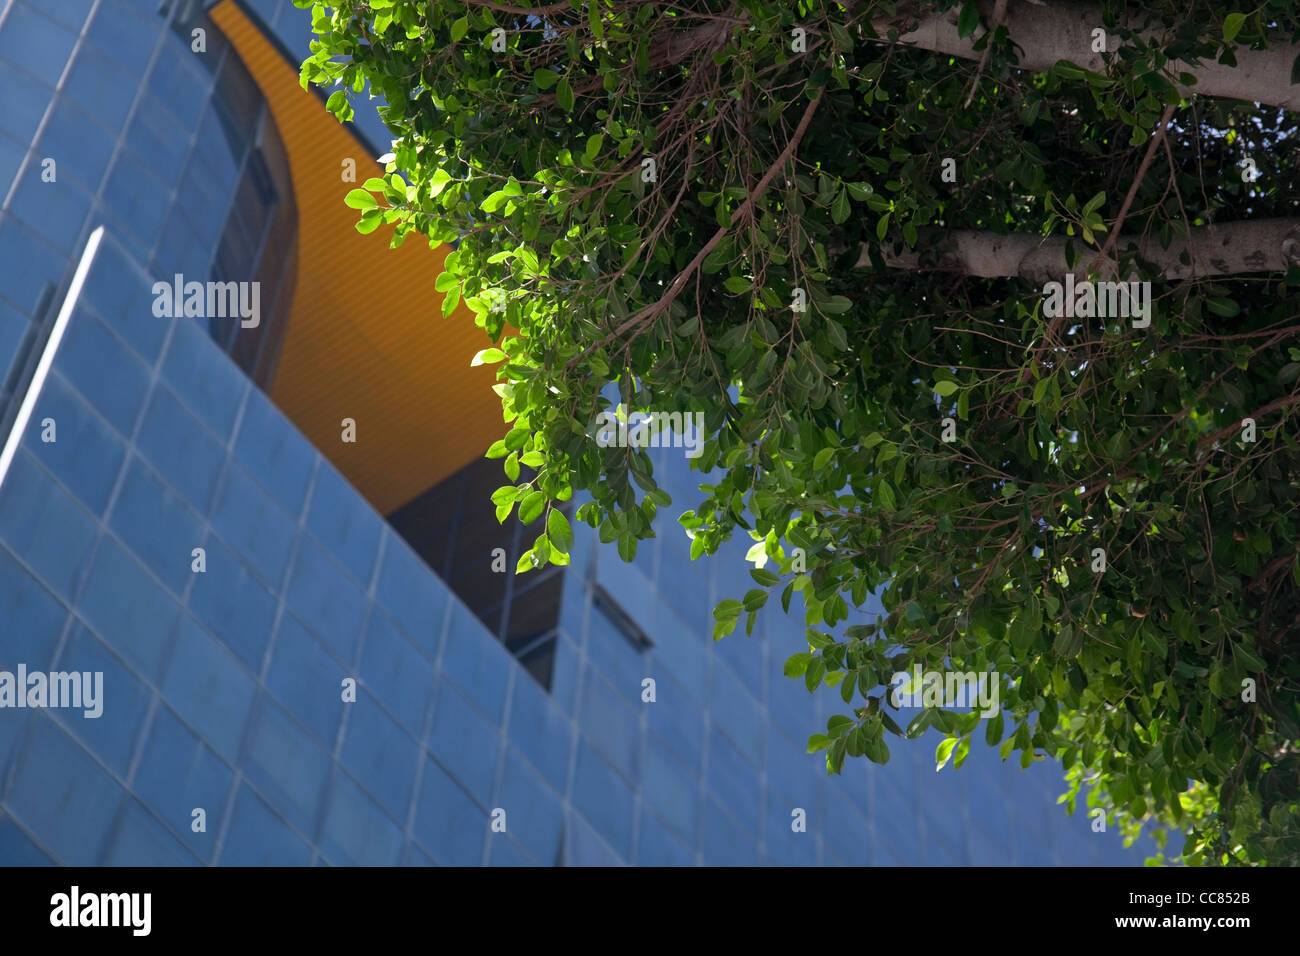 Sunlit leaves of a tree outlined against a modern blue building on Rothschild Boulevard Tel Aviv Israel - Stock Image